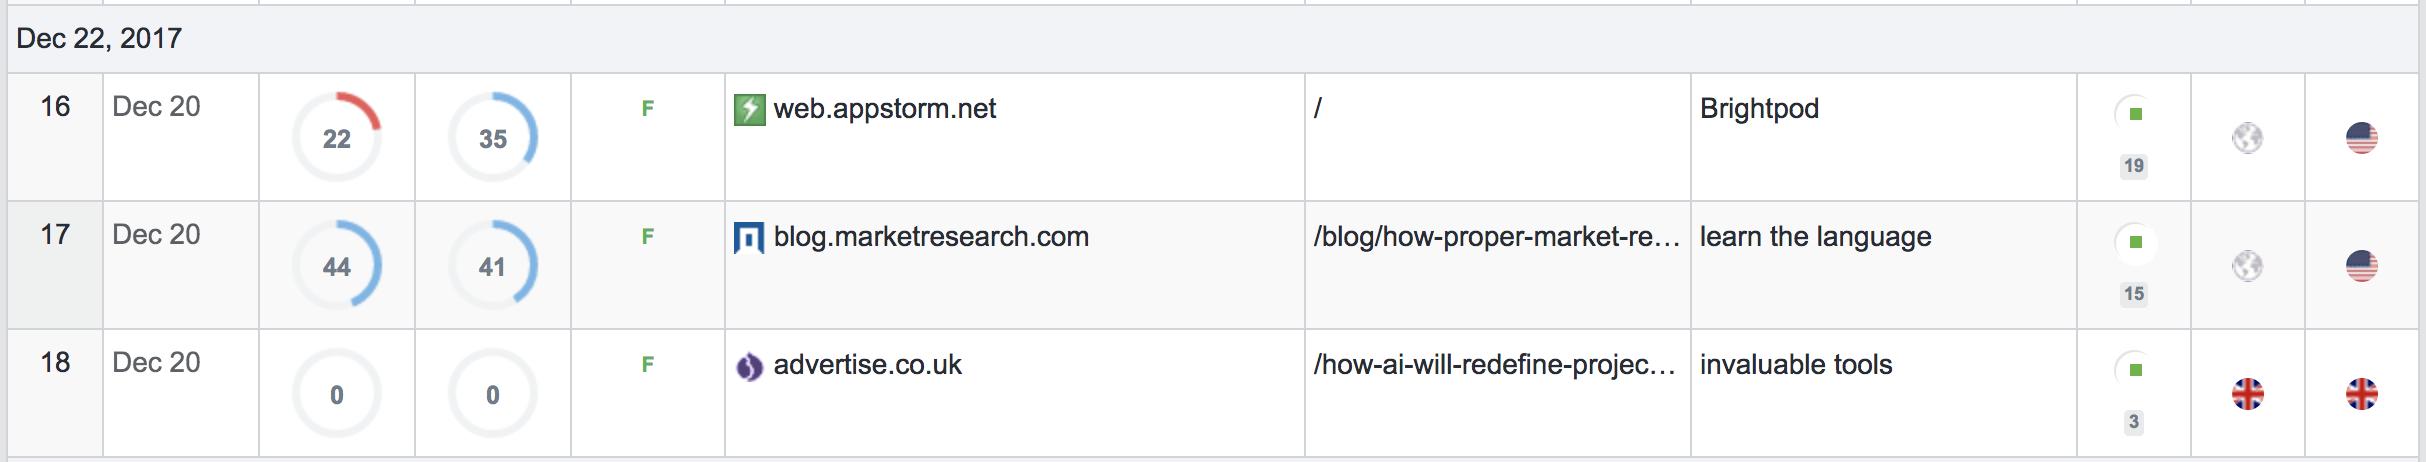 backlink-checking-tool